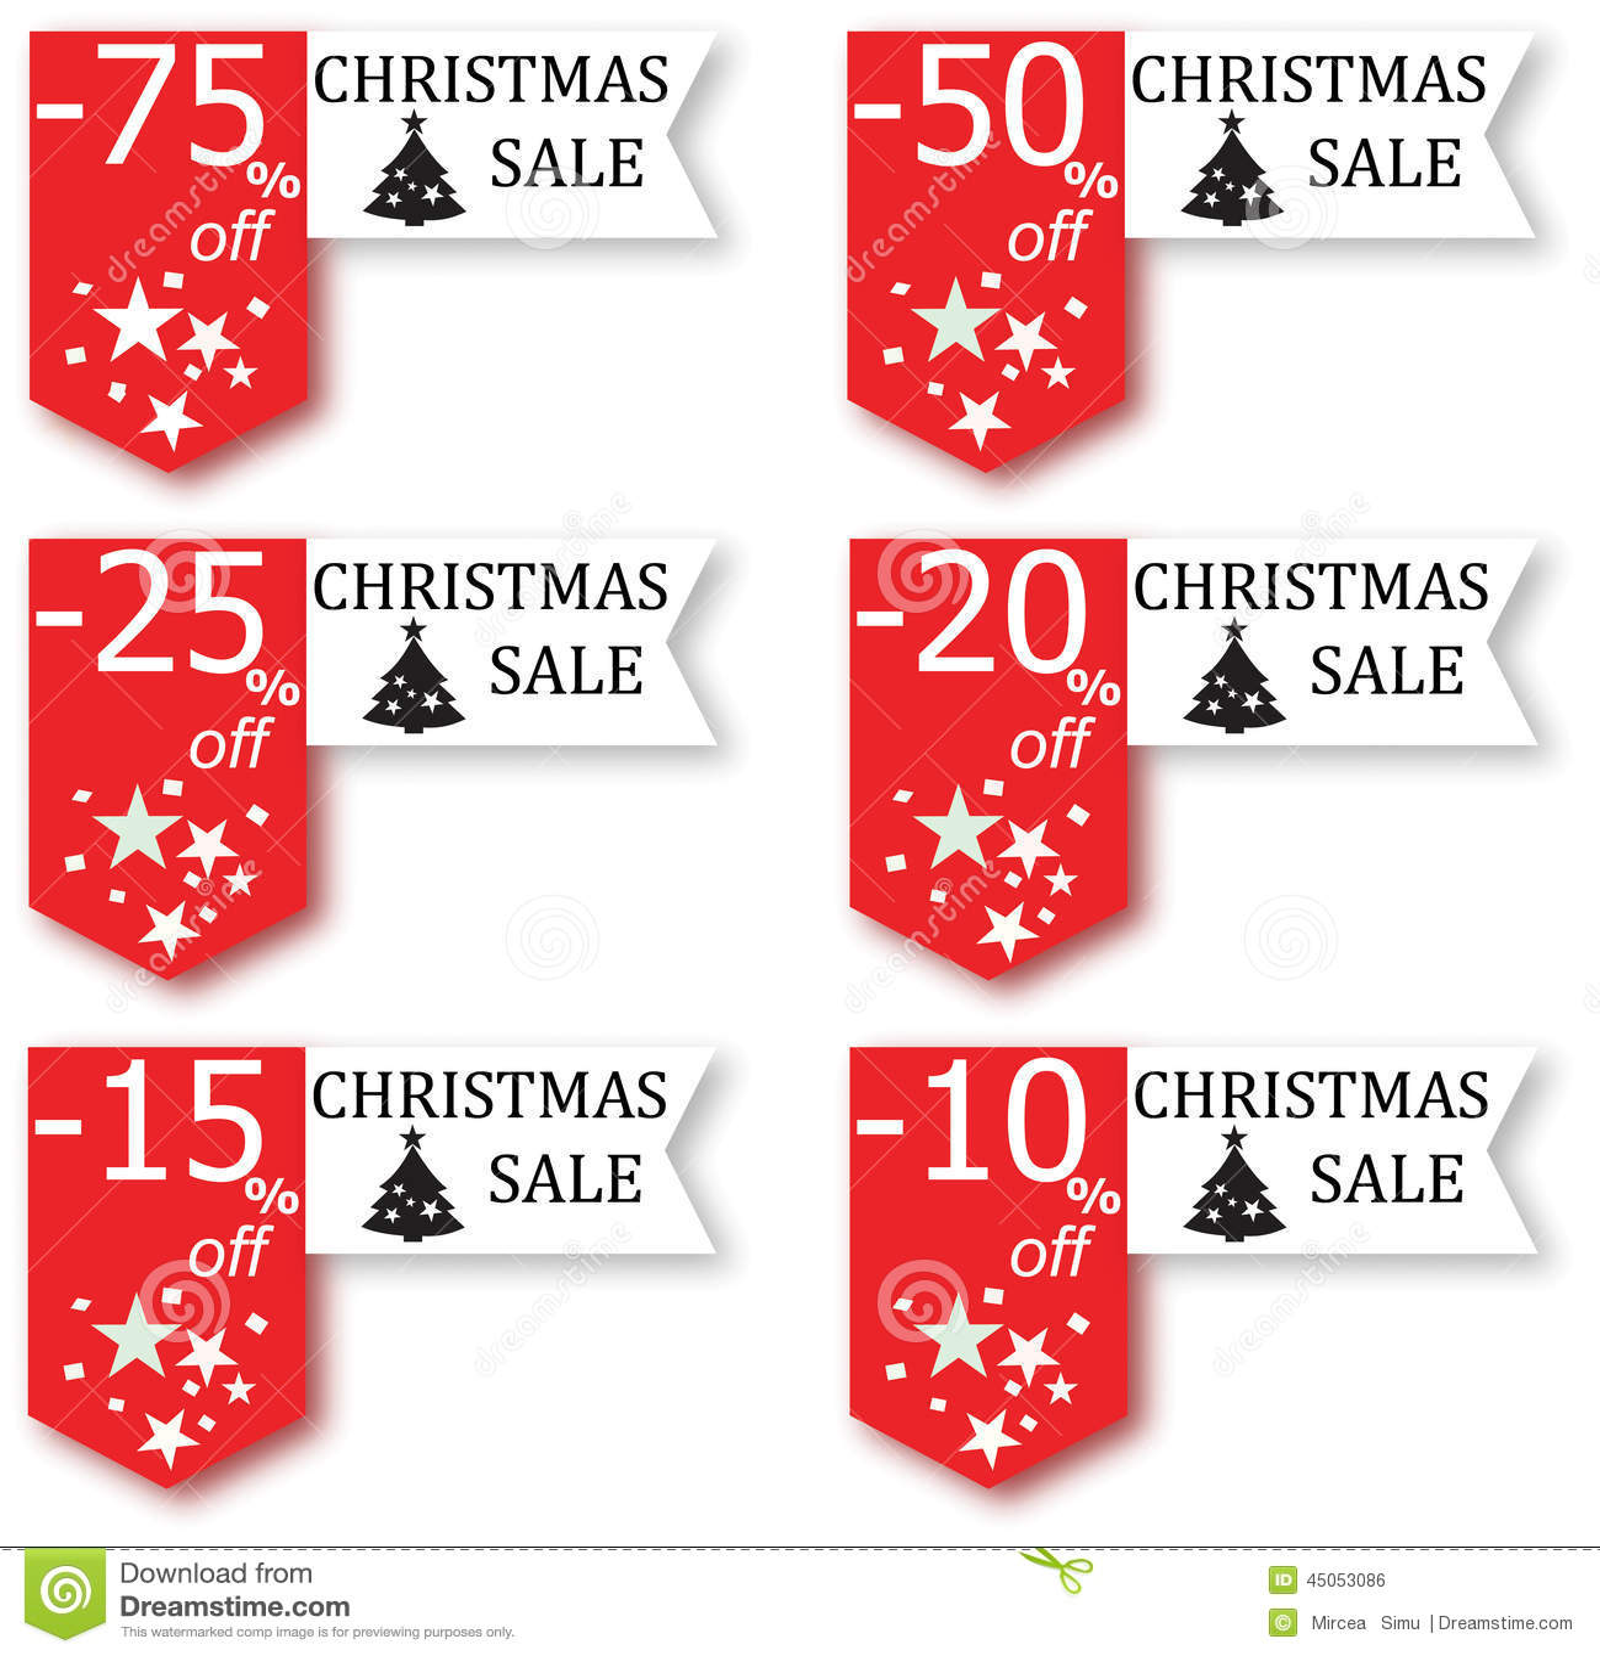 christmas sale sign stock illustration illustration of icon 45053086